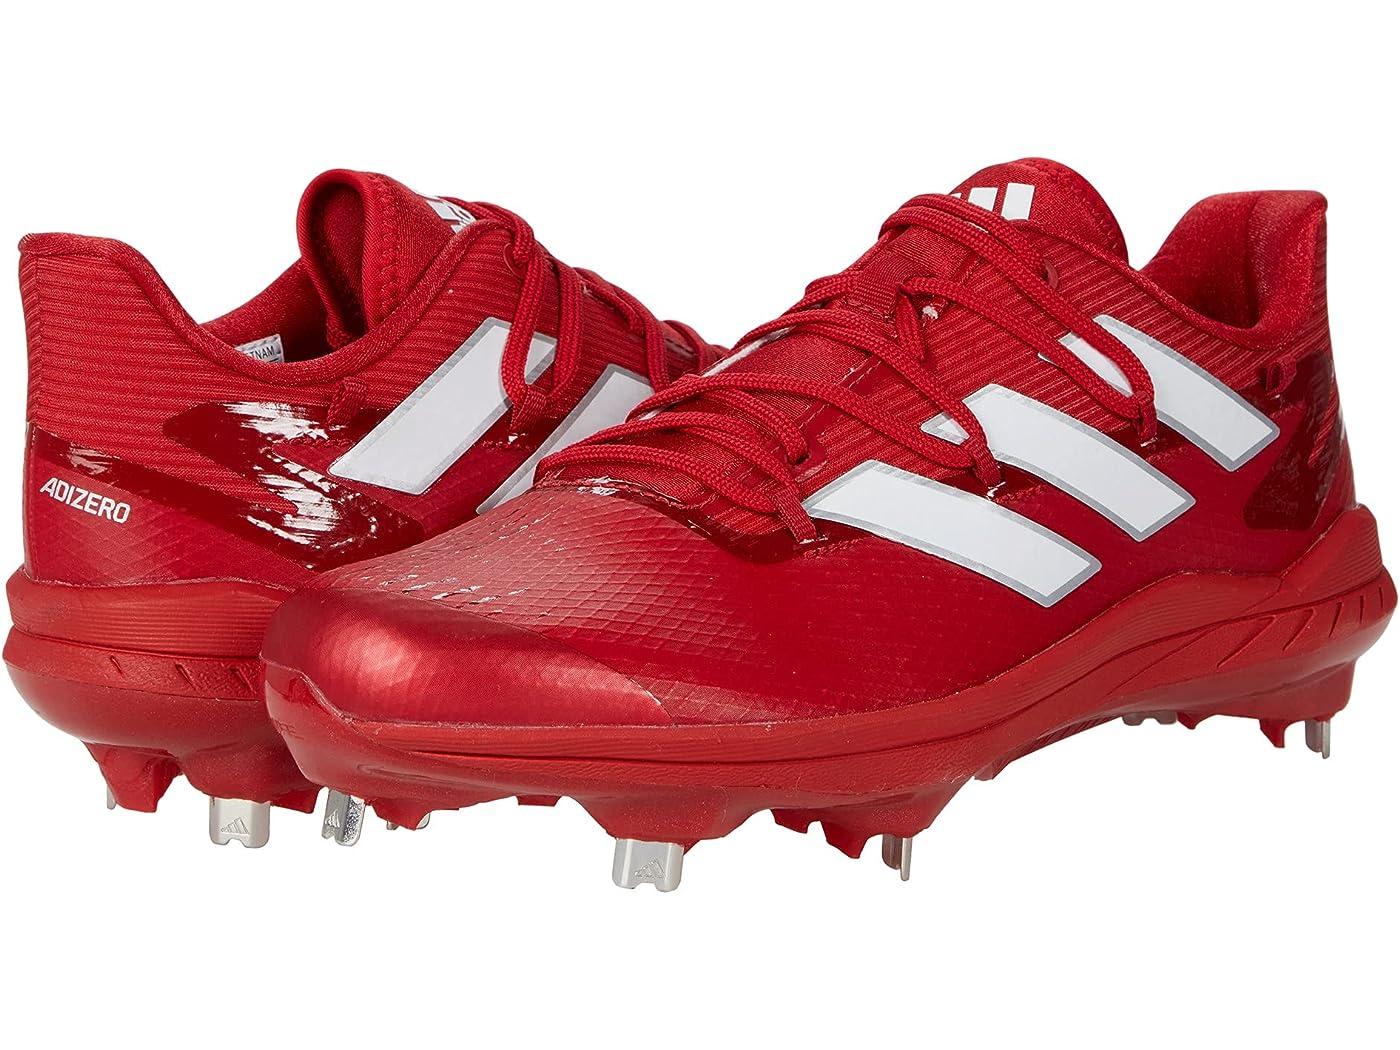 Adidas Adizero Afterburner 8 Baseball